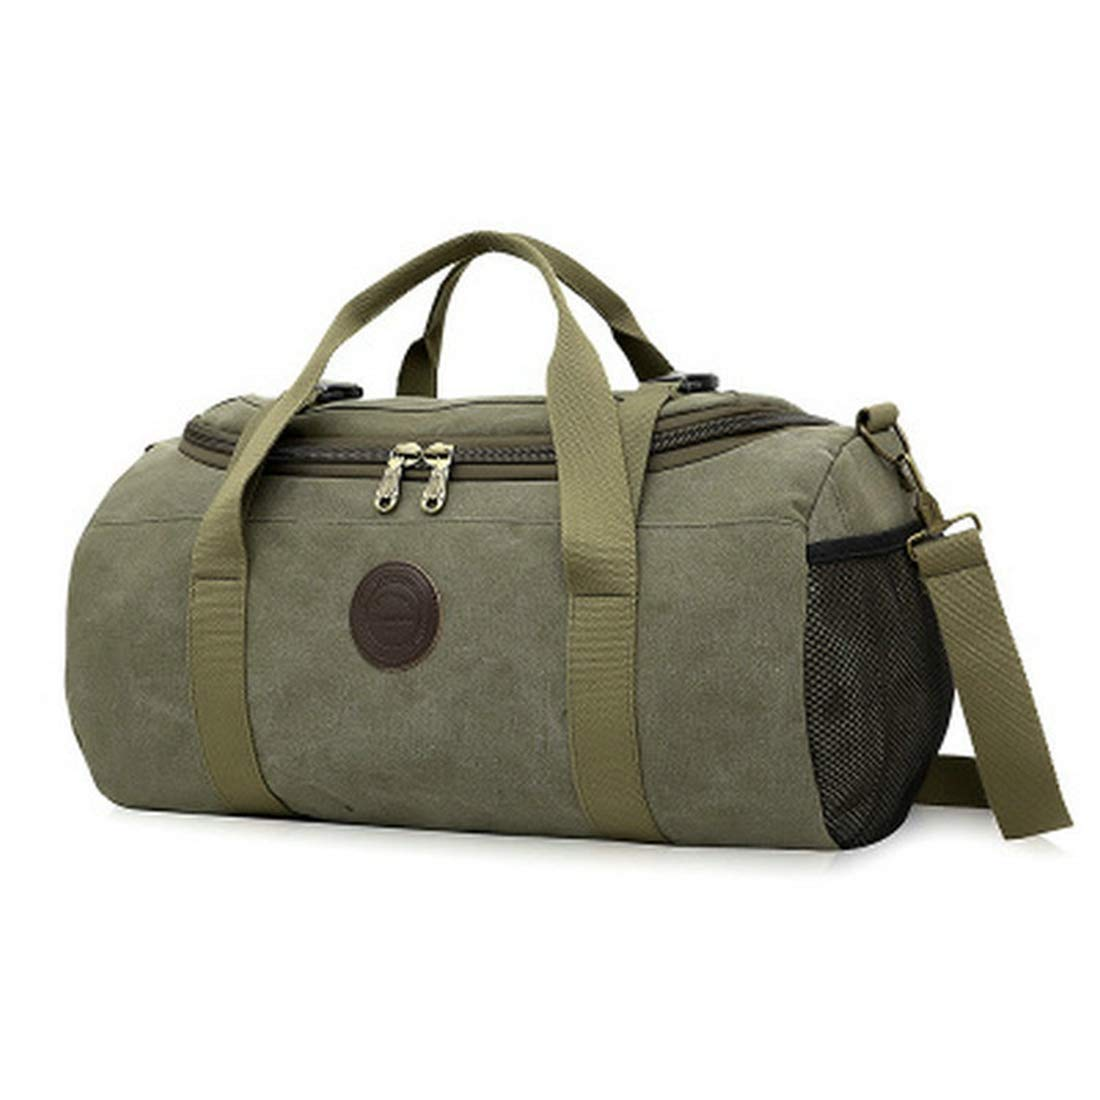 Color : Khaki Hand Luggage MATCHANT Canvas Travelling Bag Single Shoulder Drum Bag Fashion Cross Tour Package. Short Wave